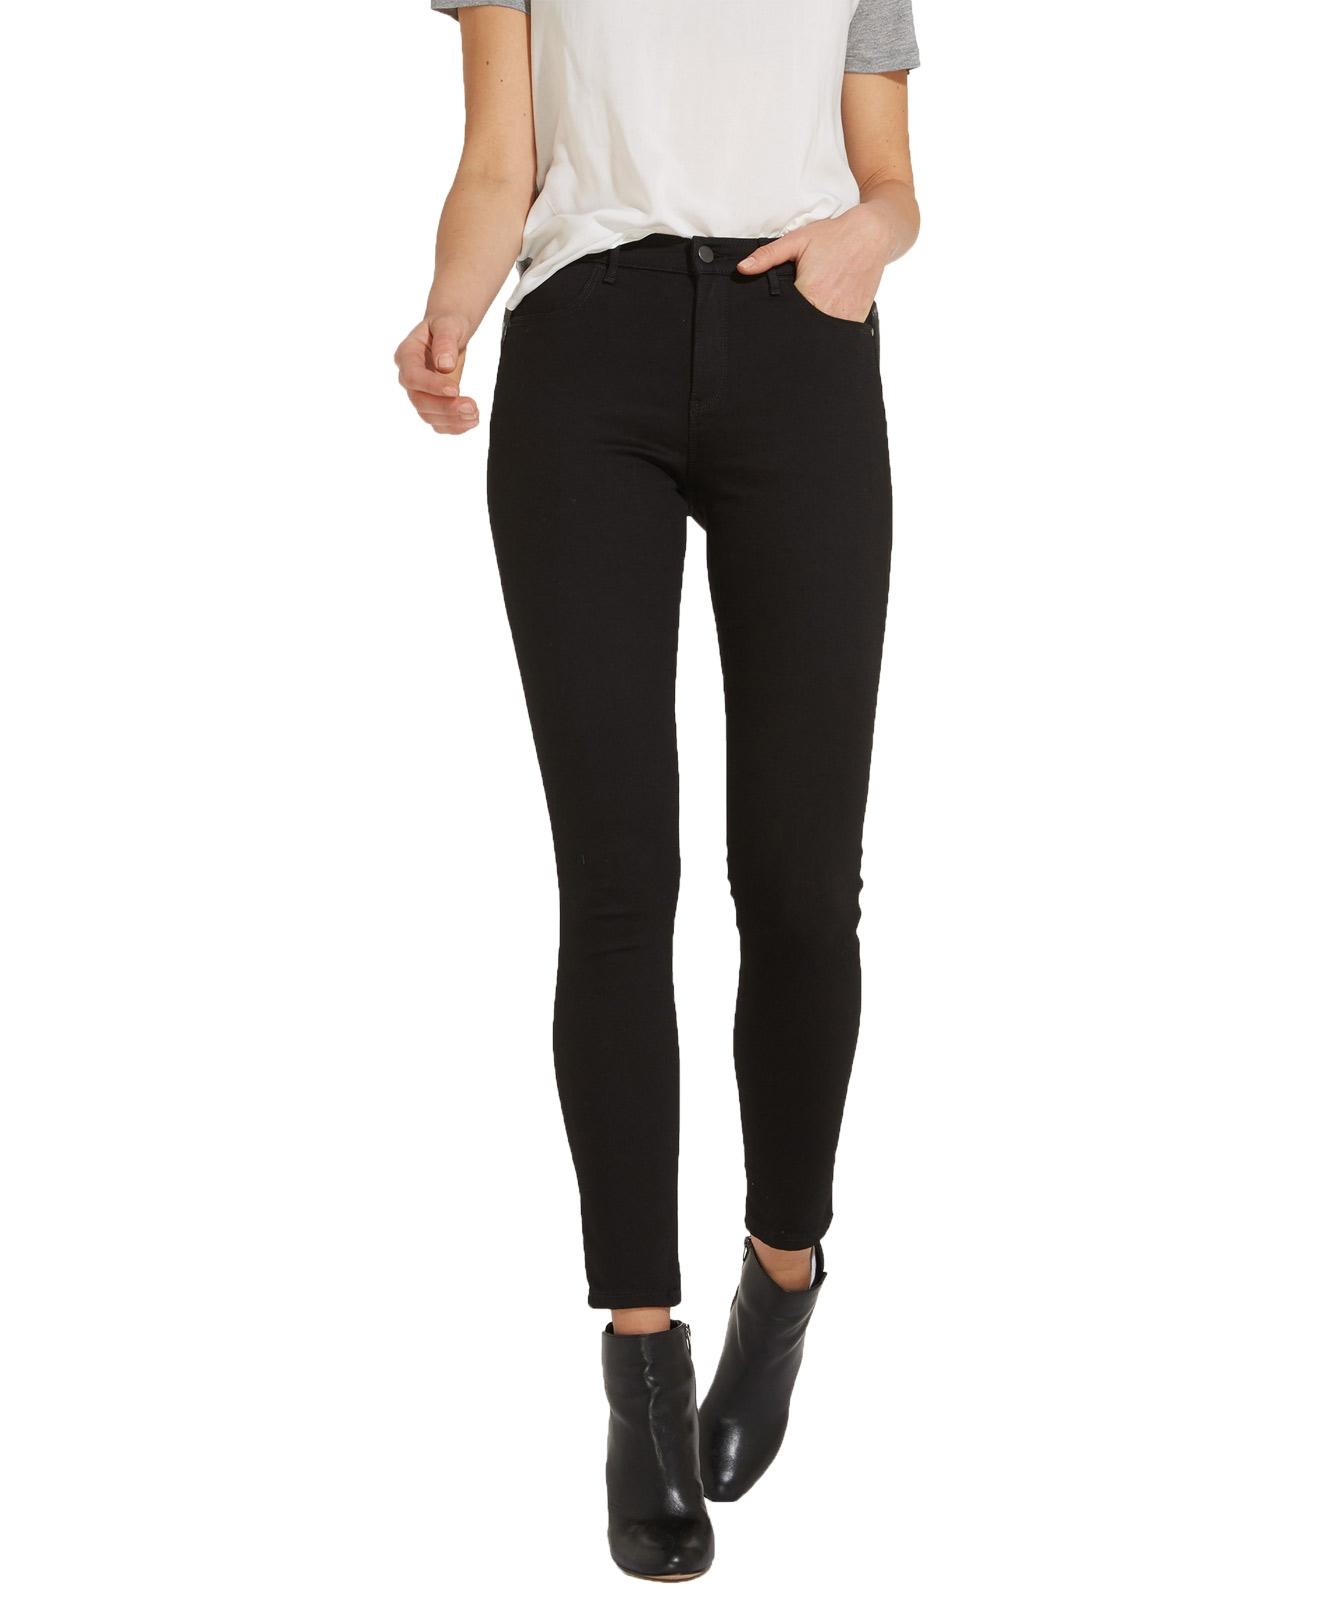 Hosen für Frauen - WRANGLER HIGH RISE SKINNY Jeans Rinsewash  - Onlineshop Jeans Meile